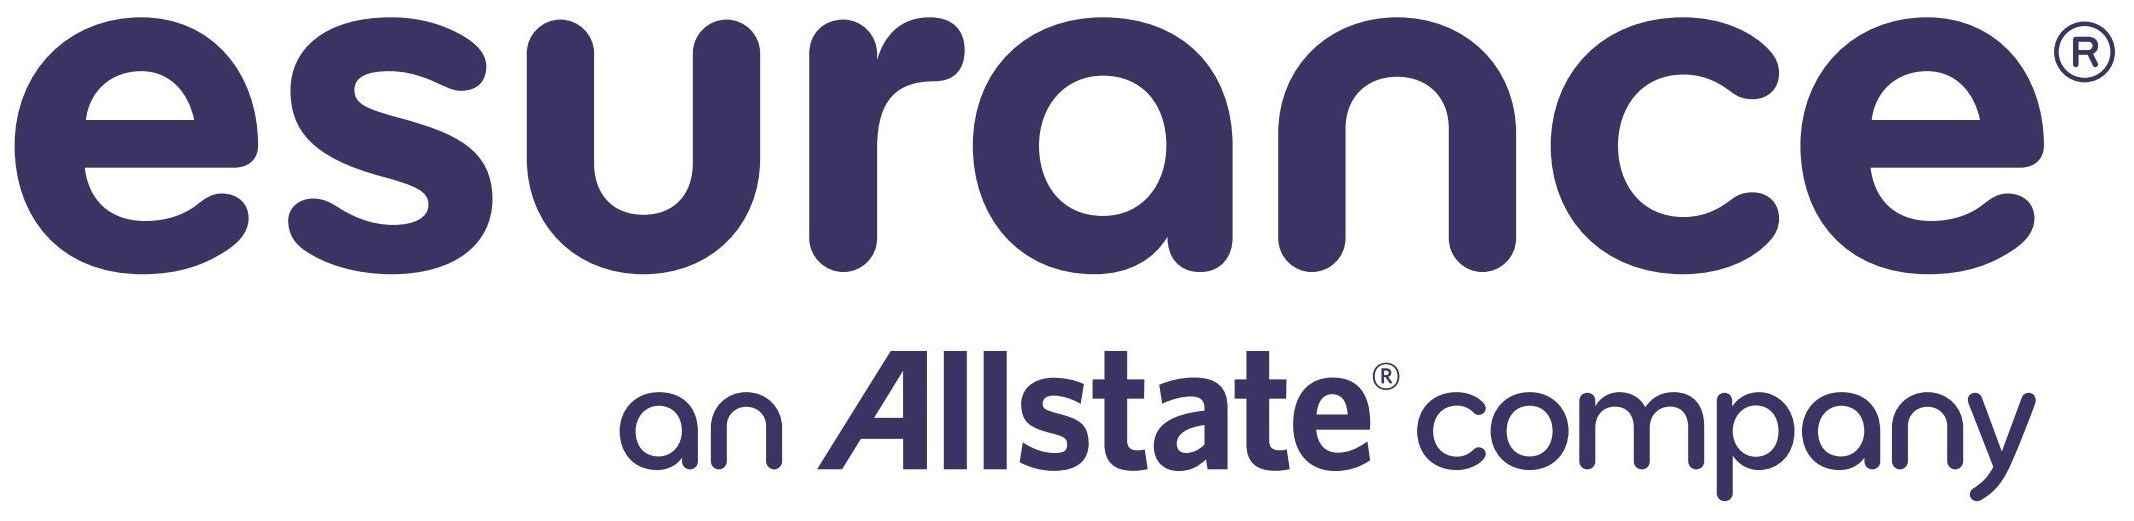 Esurance-logo